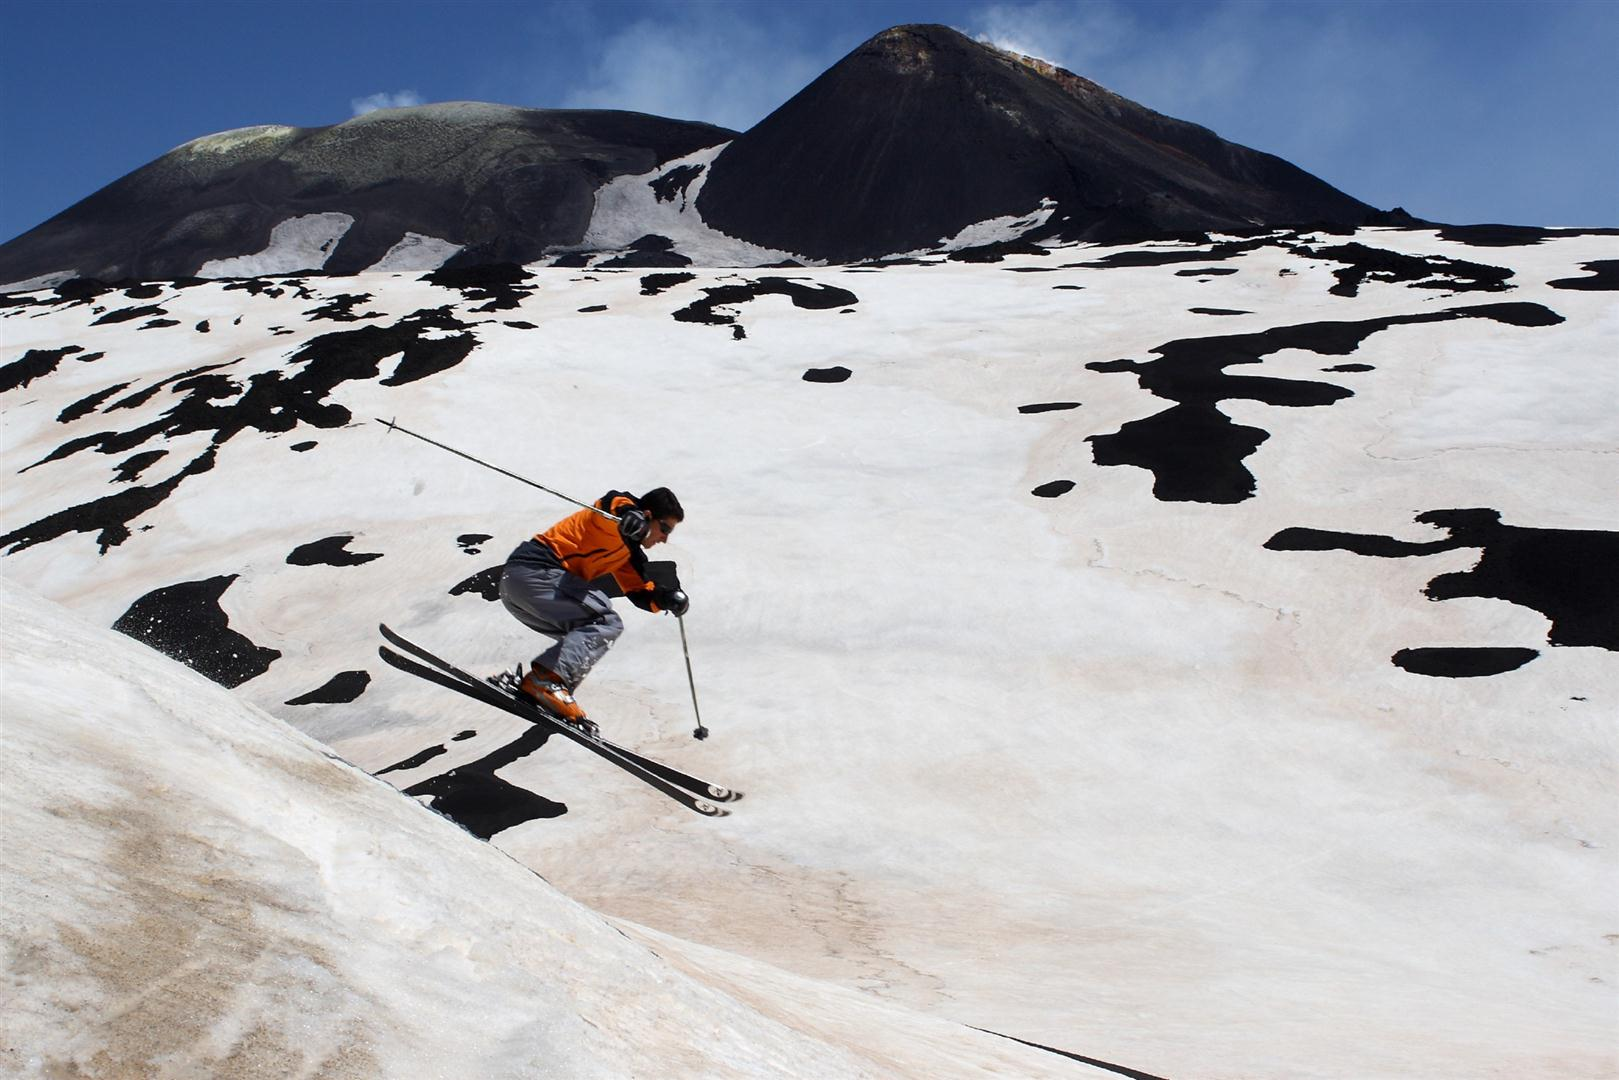 The ski resort of mount etna sud has 5 plants 1 gondola 1 chair lifts